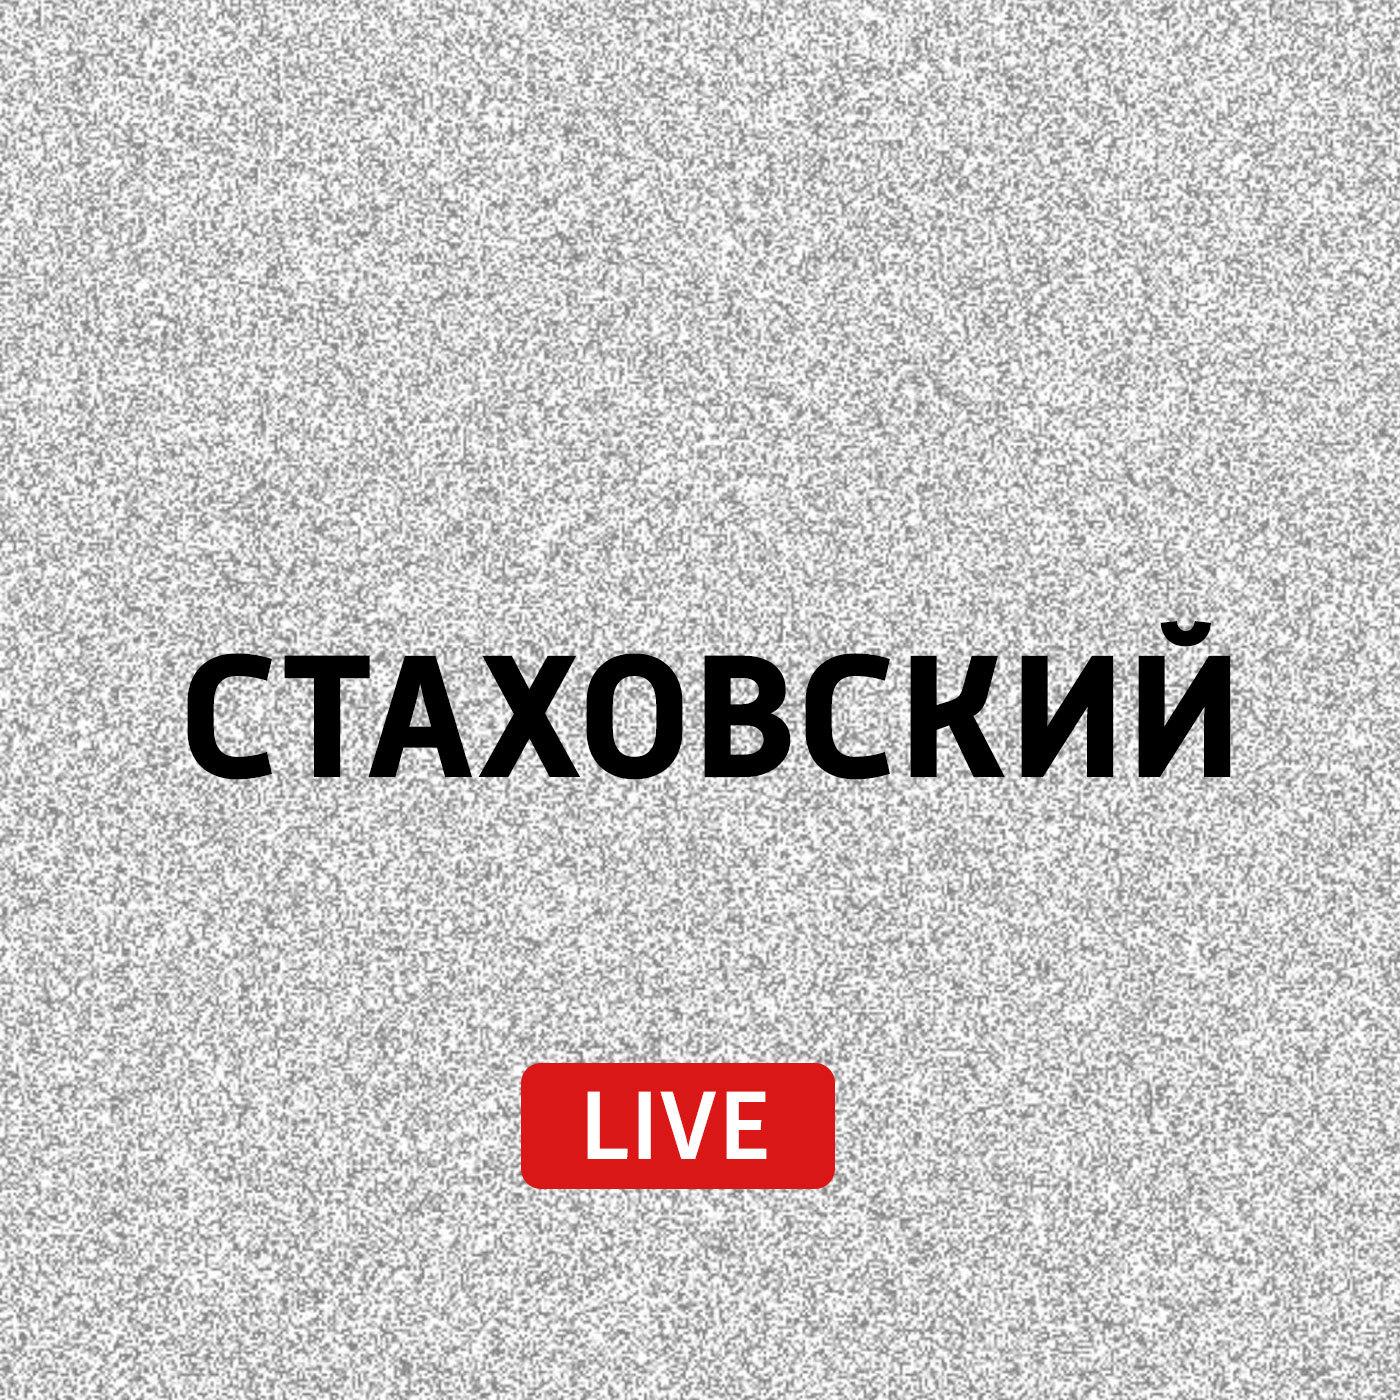 Евгений Стаховский Холиварчик евгений меркулов листья песни для друзей